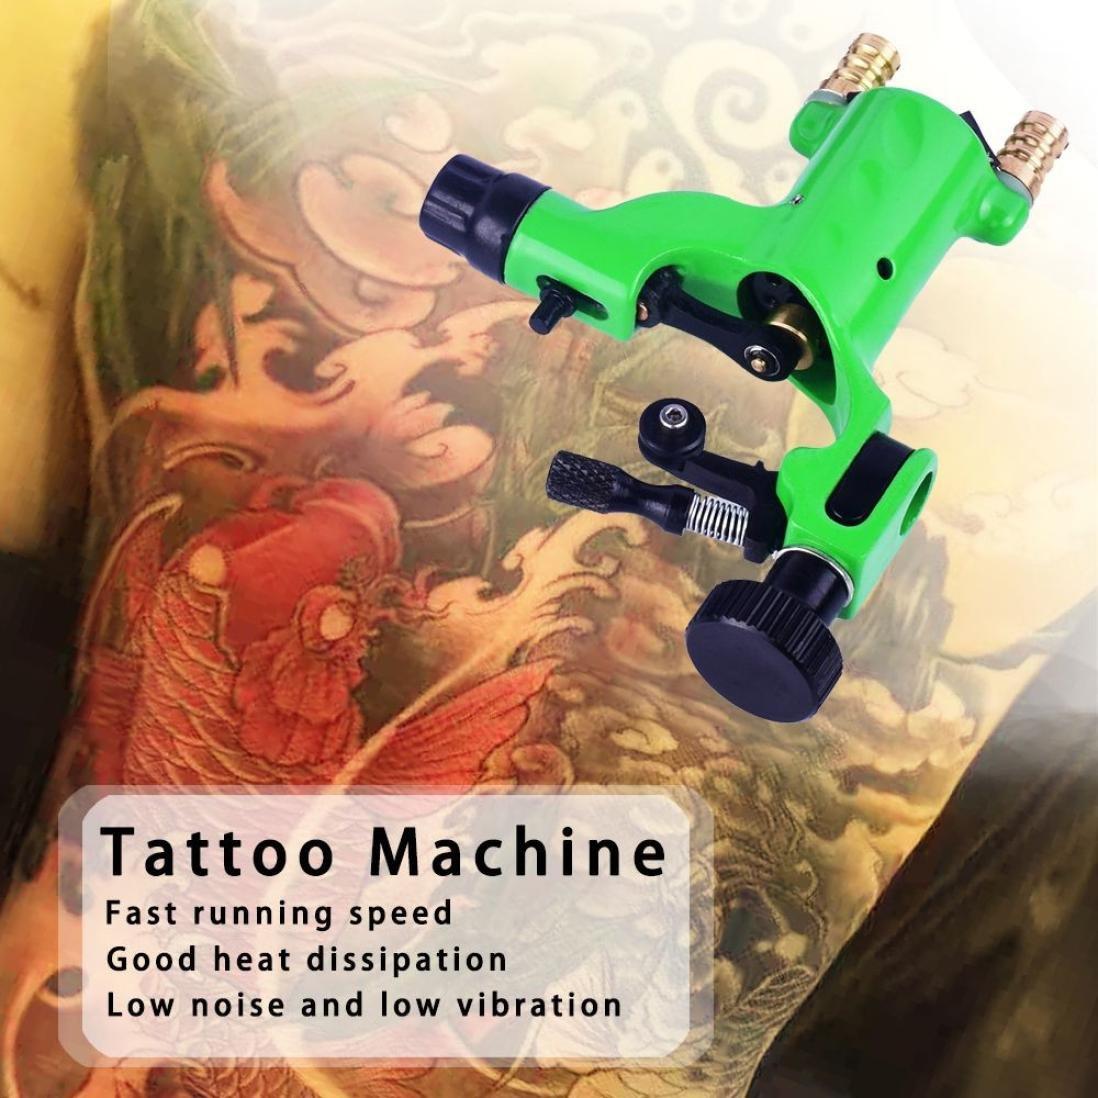 Amazon.com: Tatuaje del Motor Lavadora, hatop Professional ...